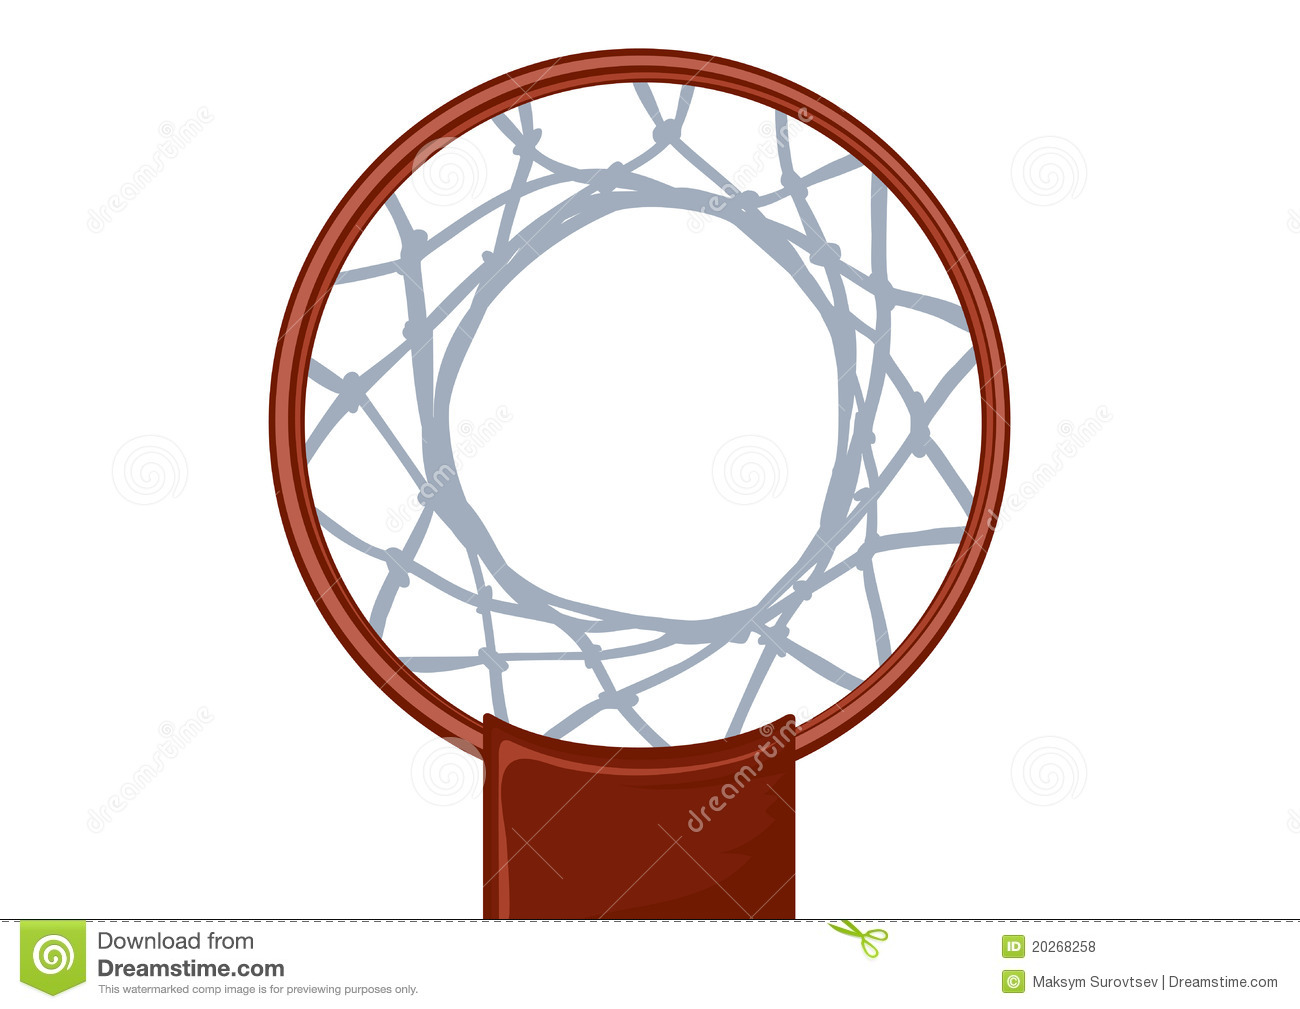 Basketball Hoop Clipart Free Download Best Diagram 1300x1009 Ring Net Asian Contenent Context